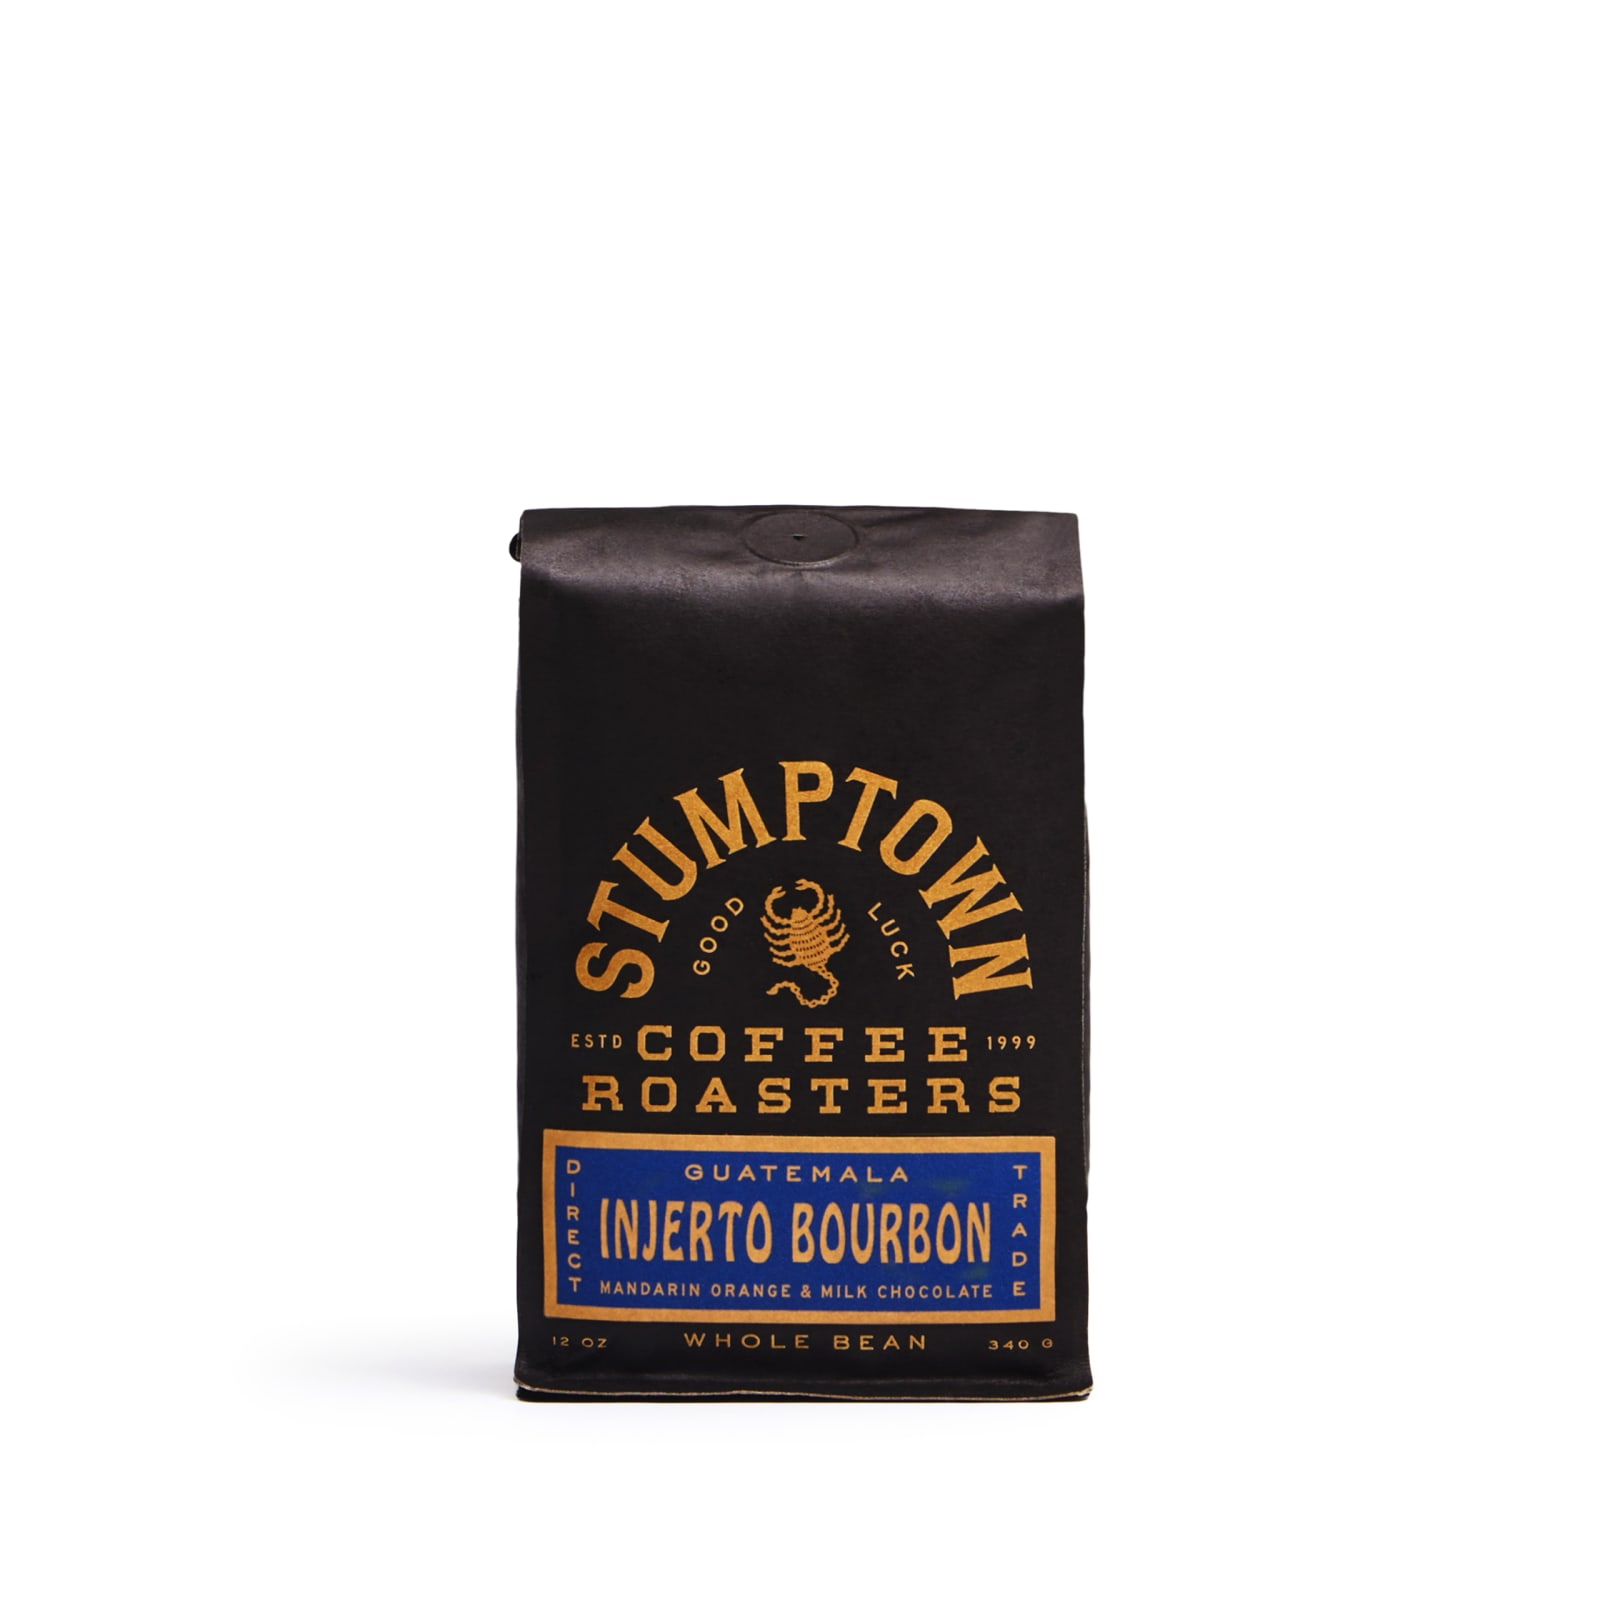 Guatemala El Injerto Bourbon